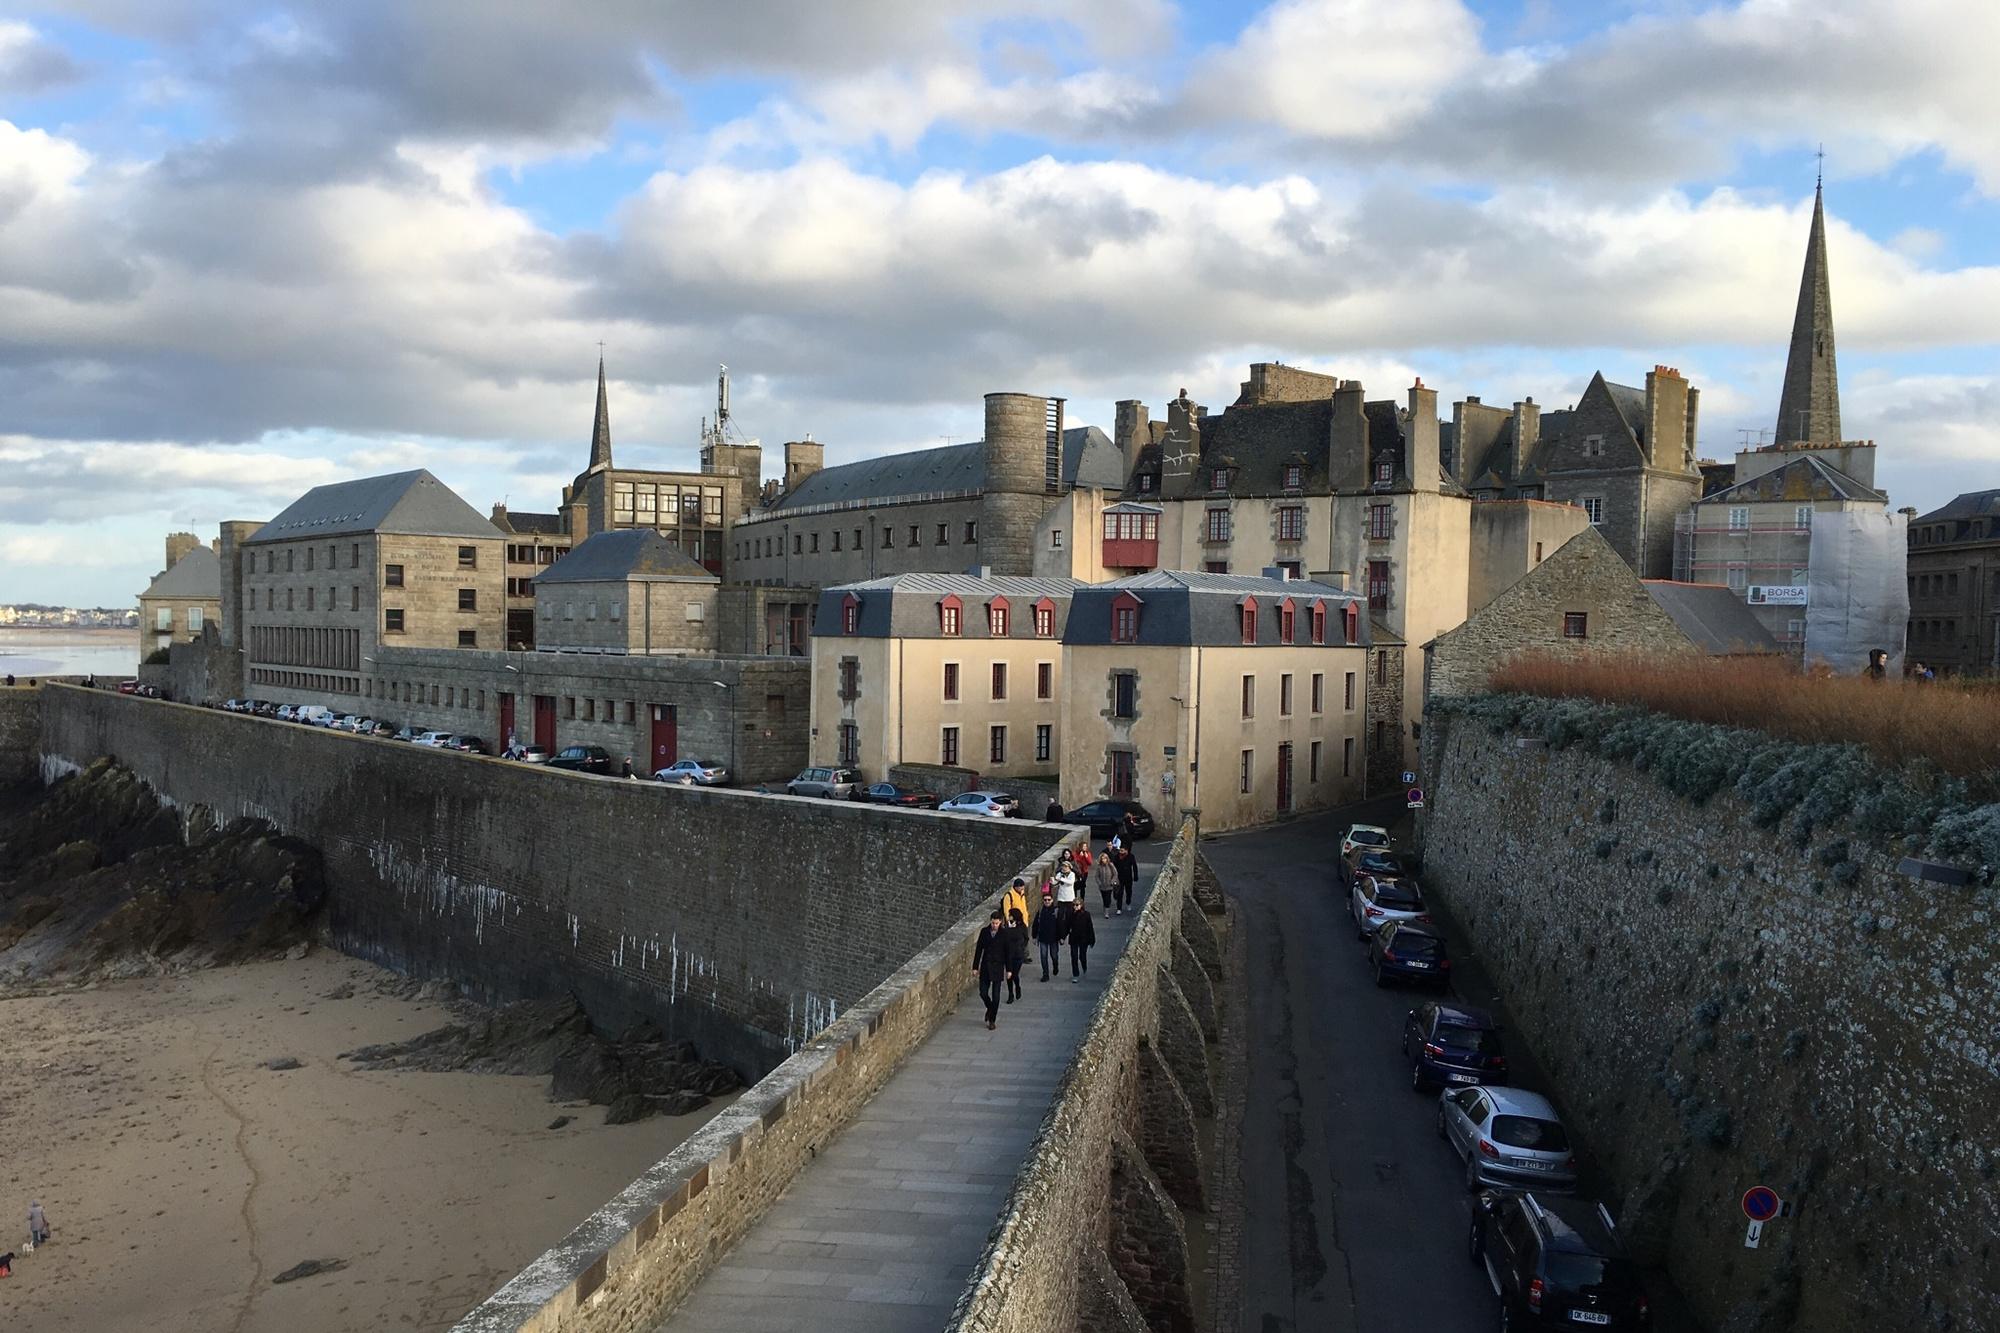 De impressionante omwalling van Saint-Malo., Getty